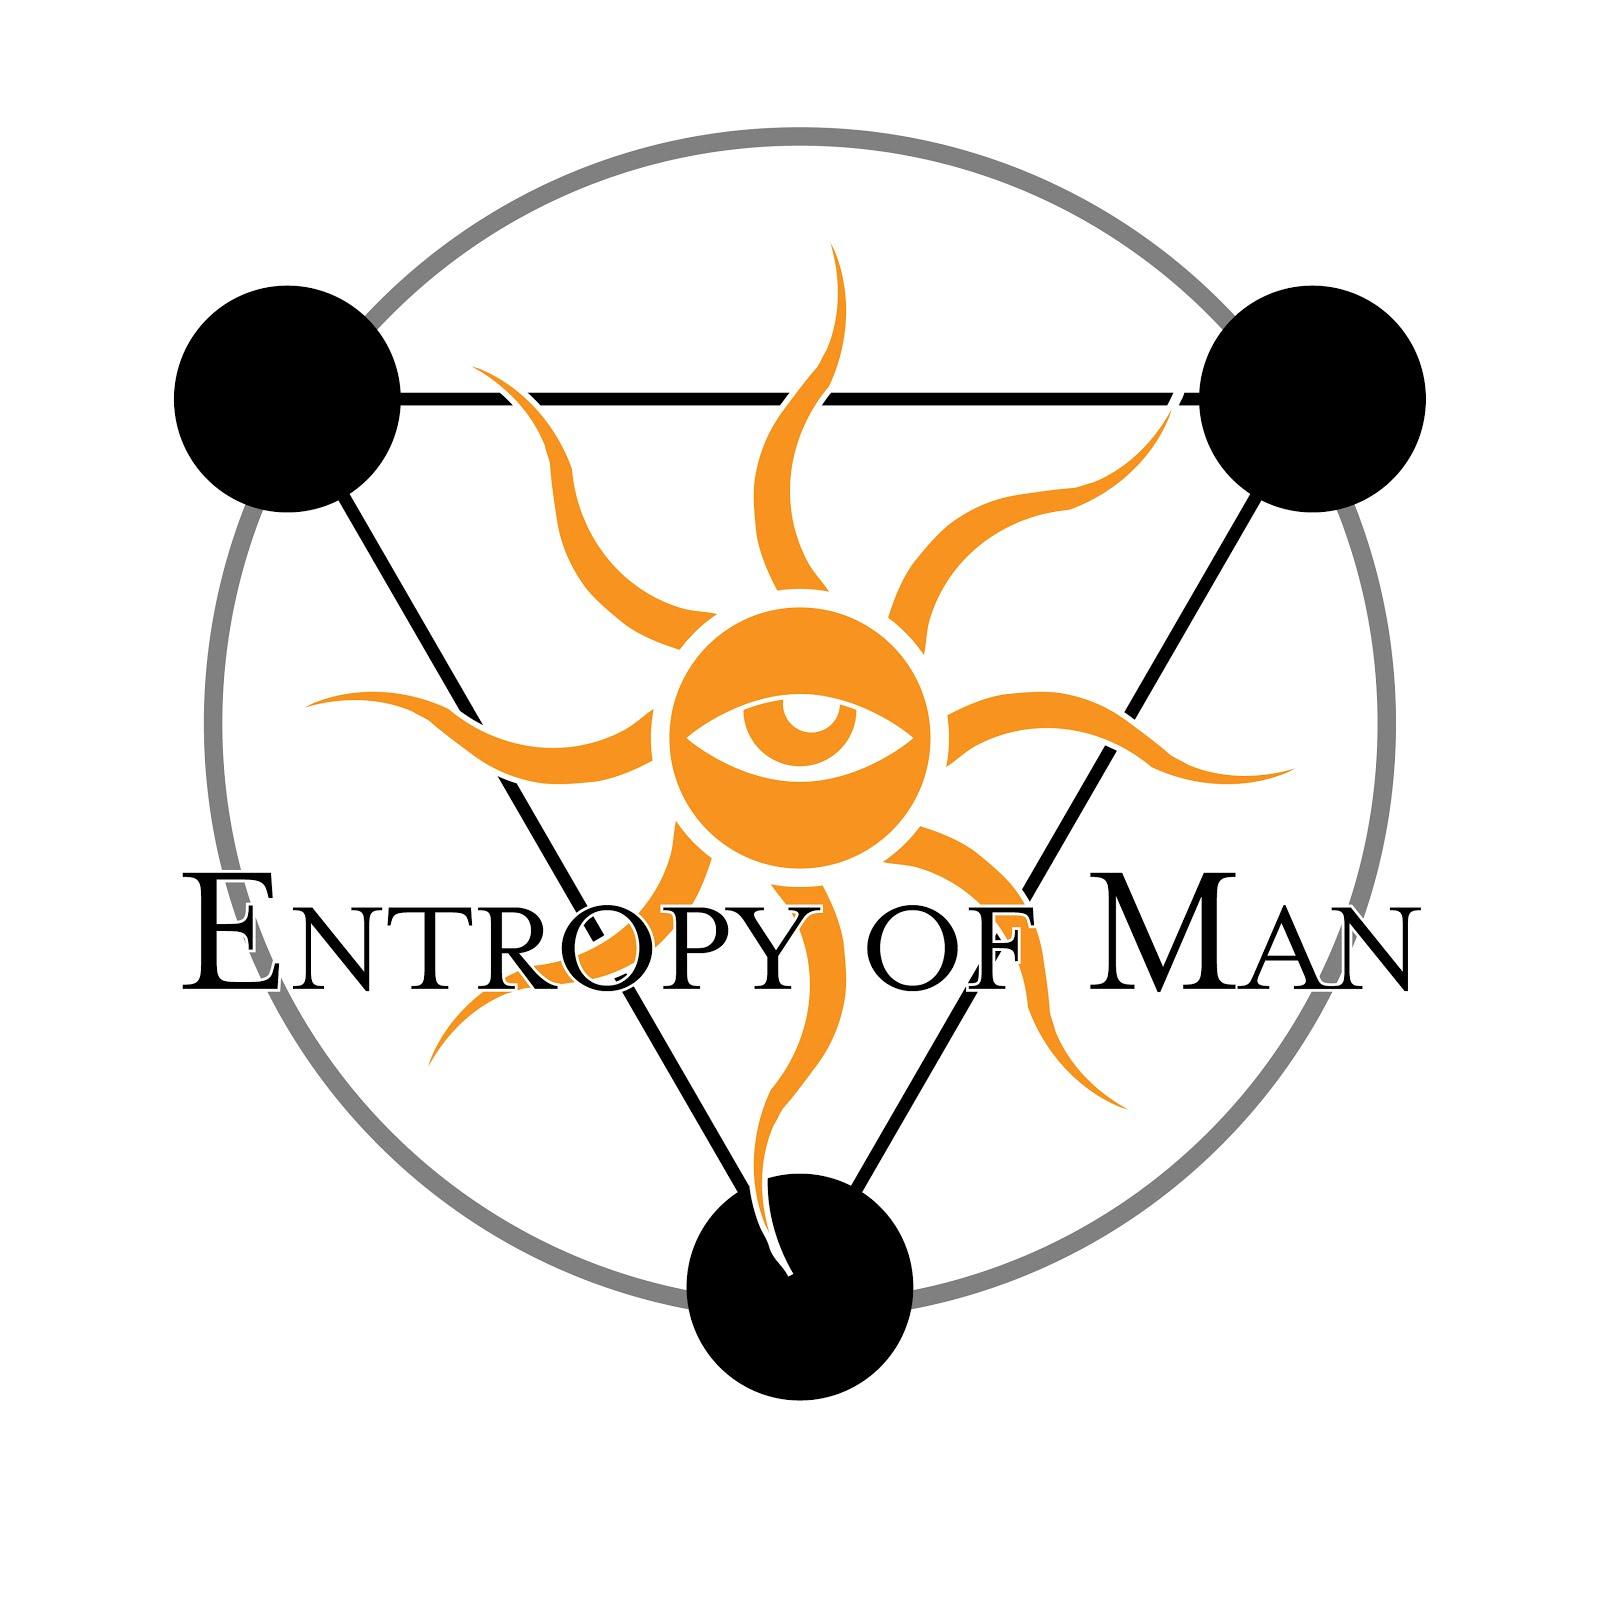 Entropy of Man